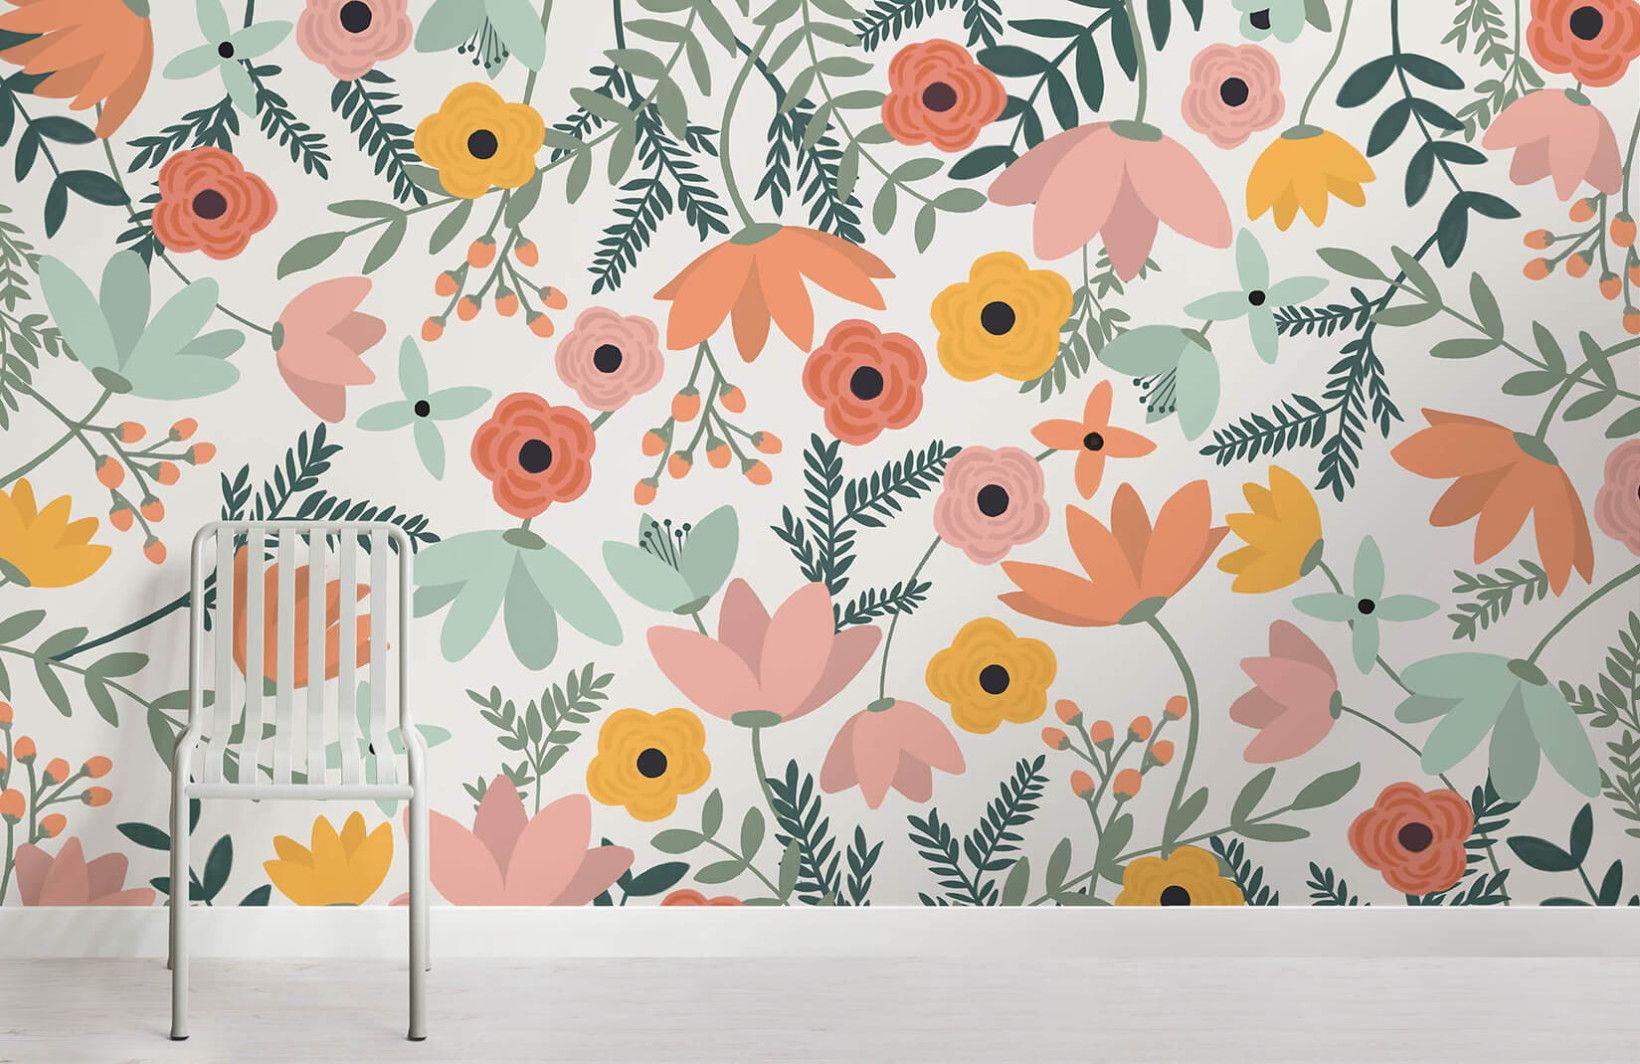 Wildflower Floral Wallpaper Mural Floral wallpaper